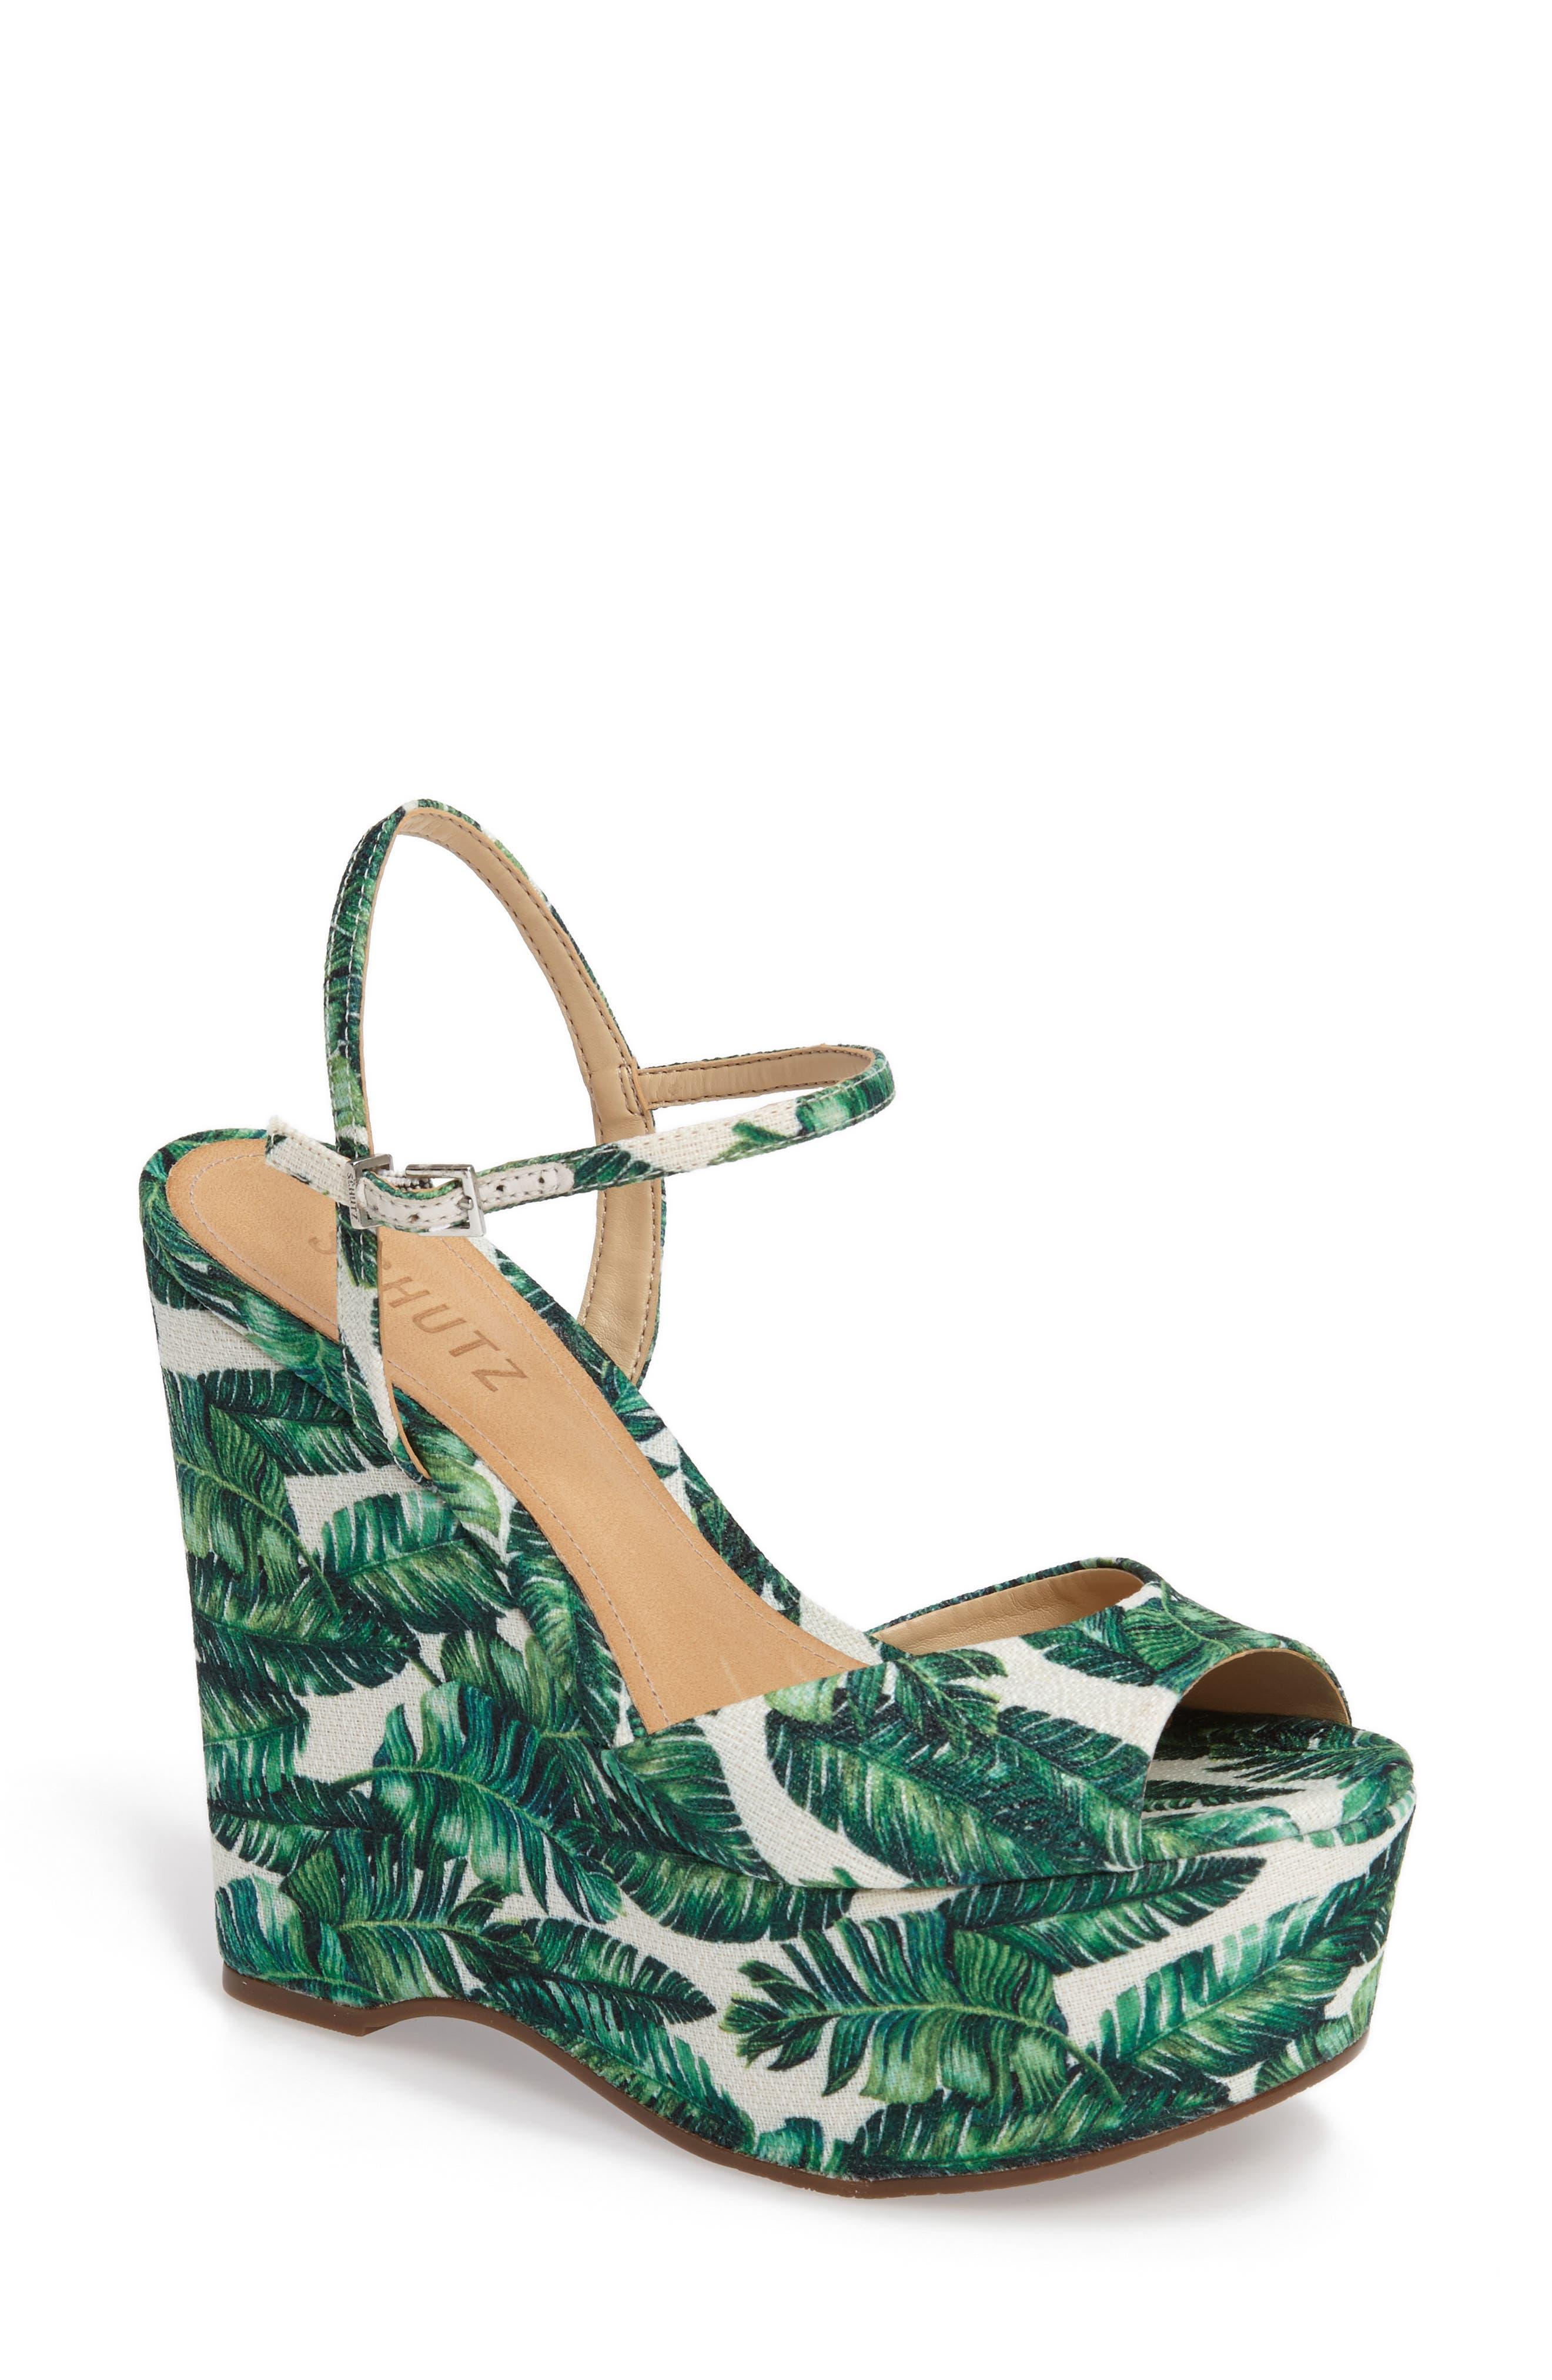 Alternate Image 1 Selected - Schutz Patrycia Wedge Sandal (Women)